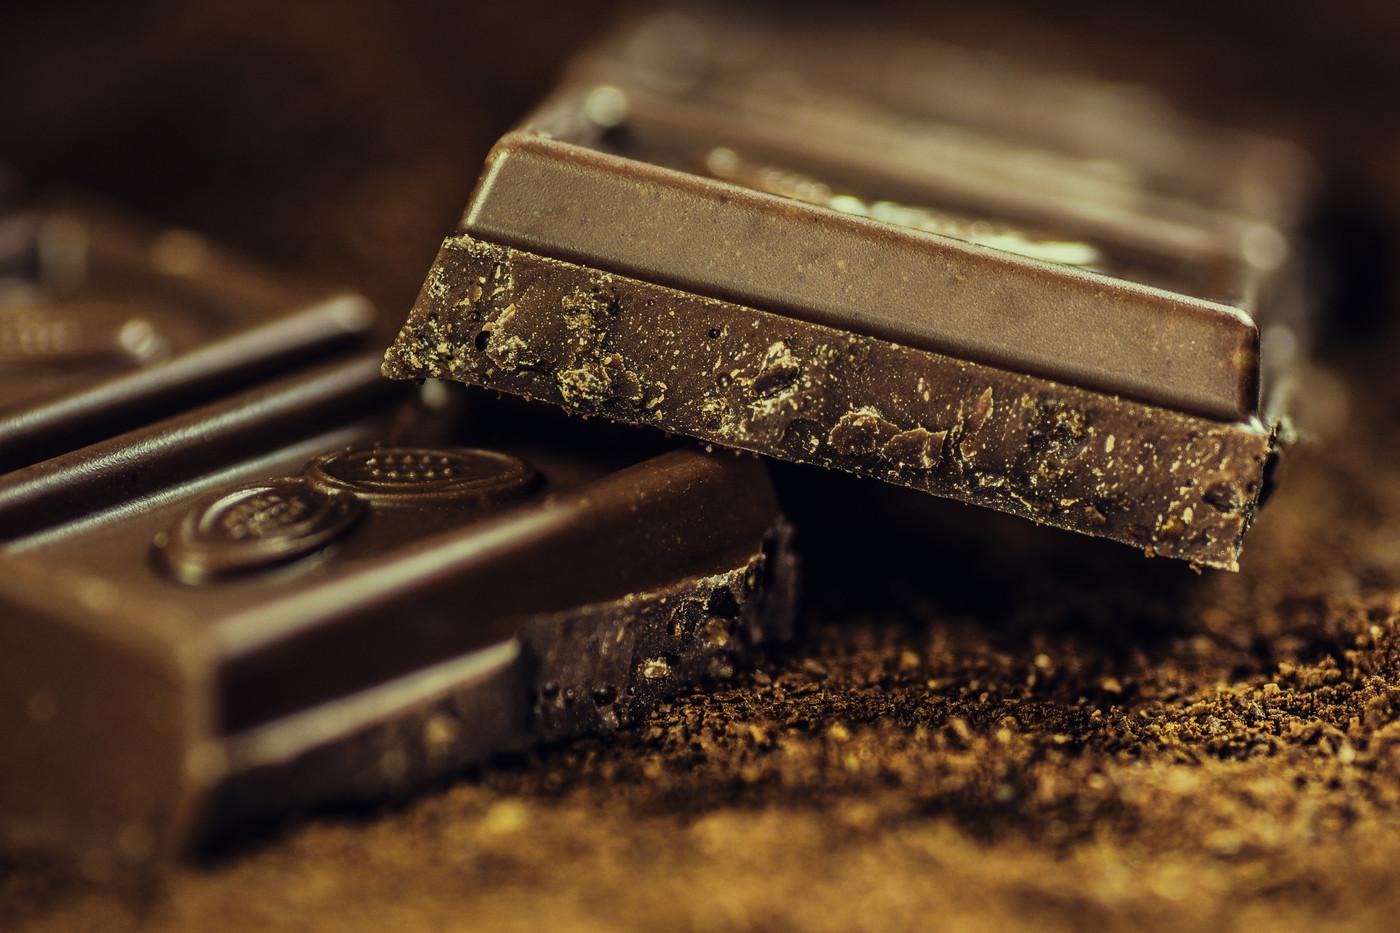 coffee-dark-candy-chocolate-65882.jpg